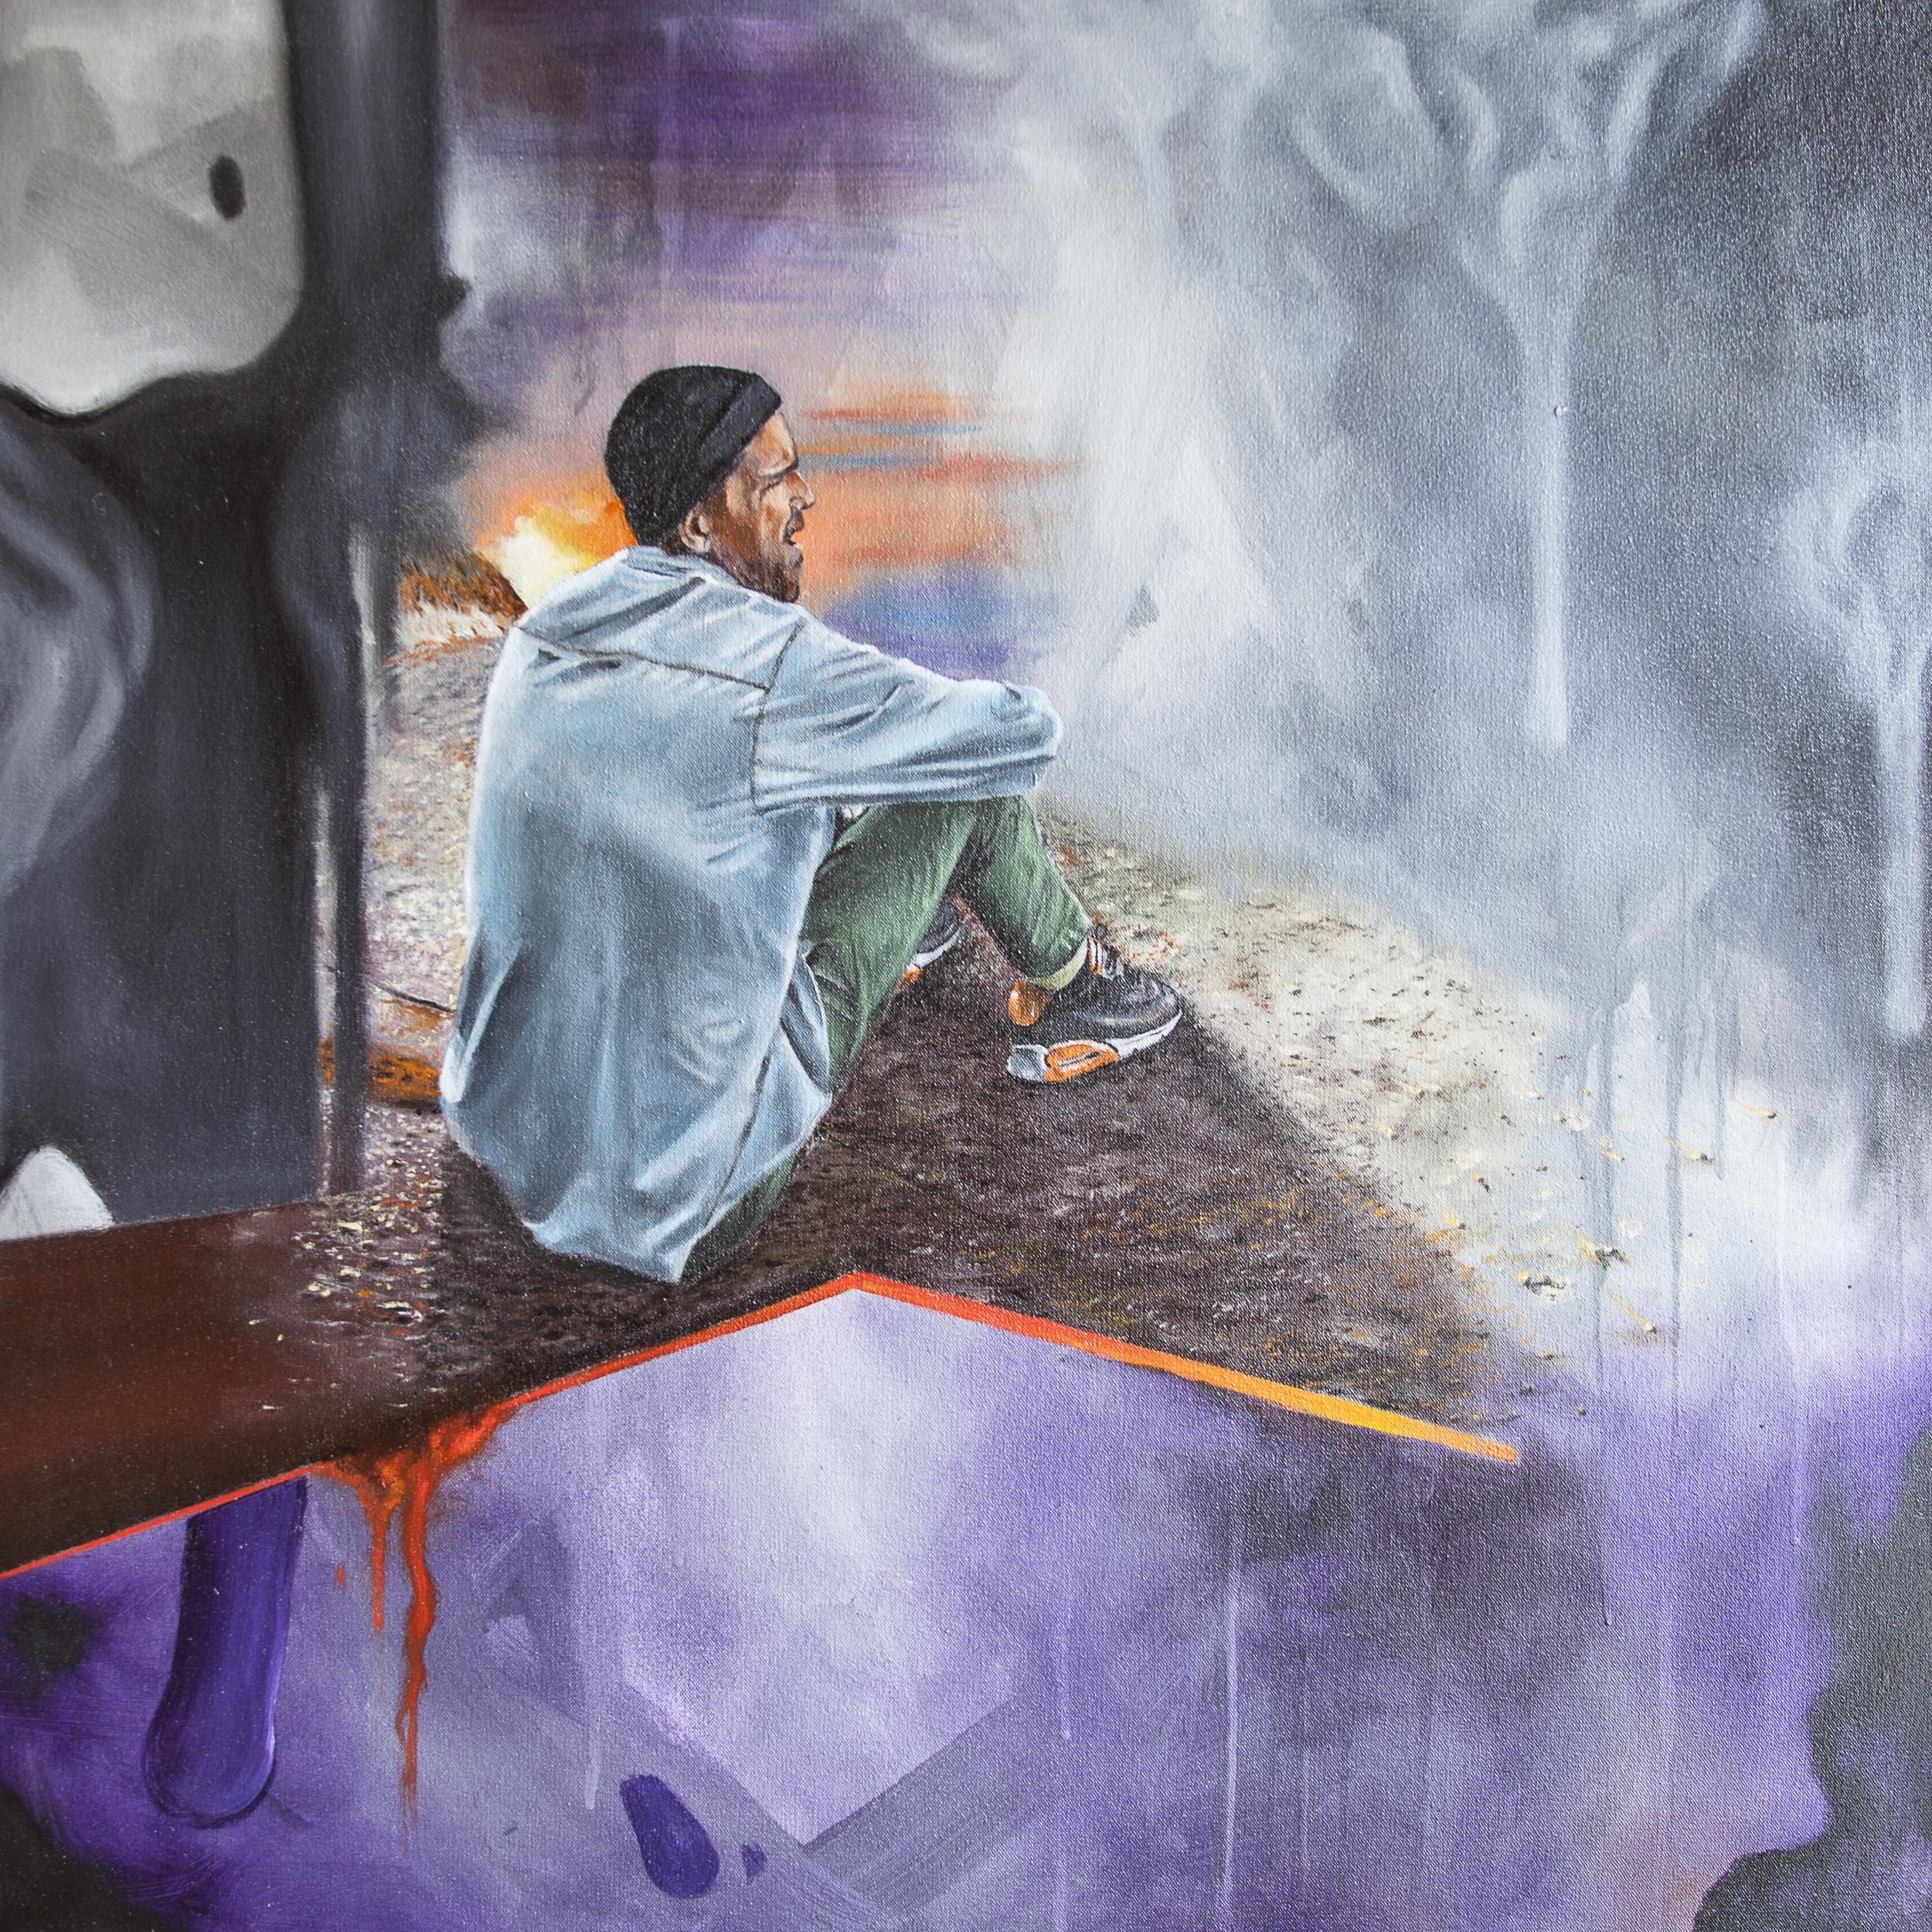 WISEKNAVE documentation for fine artist Joe Nix, Common Ground at Treason Gallery. First Thursday art walk in Pioneer Square, Seattle, WA. March, 2016 Joe Nix | WISEKNAVE.ARTDOC©